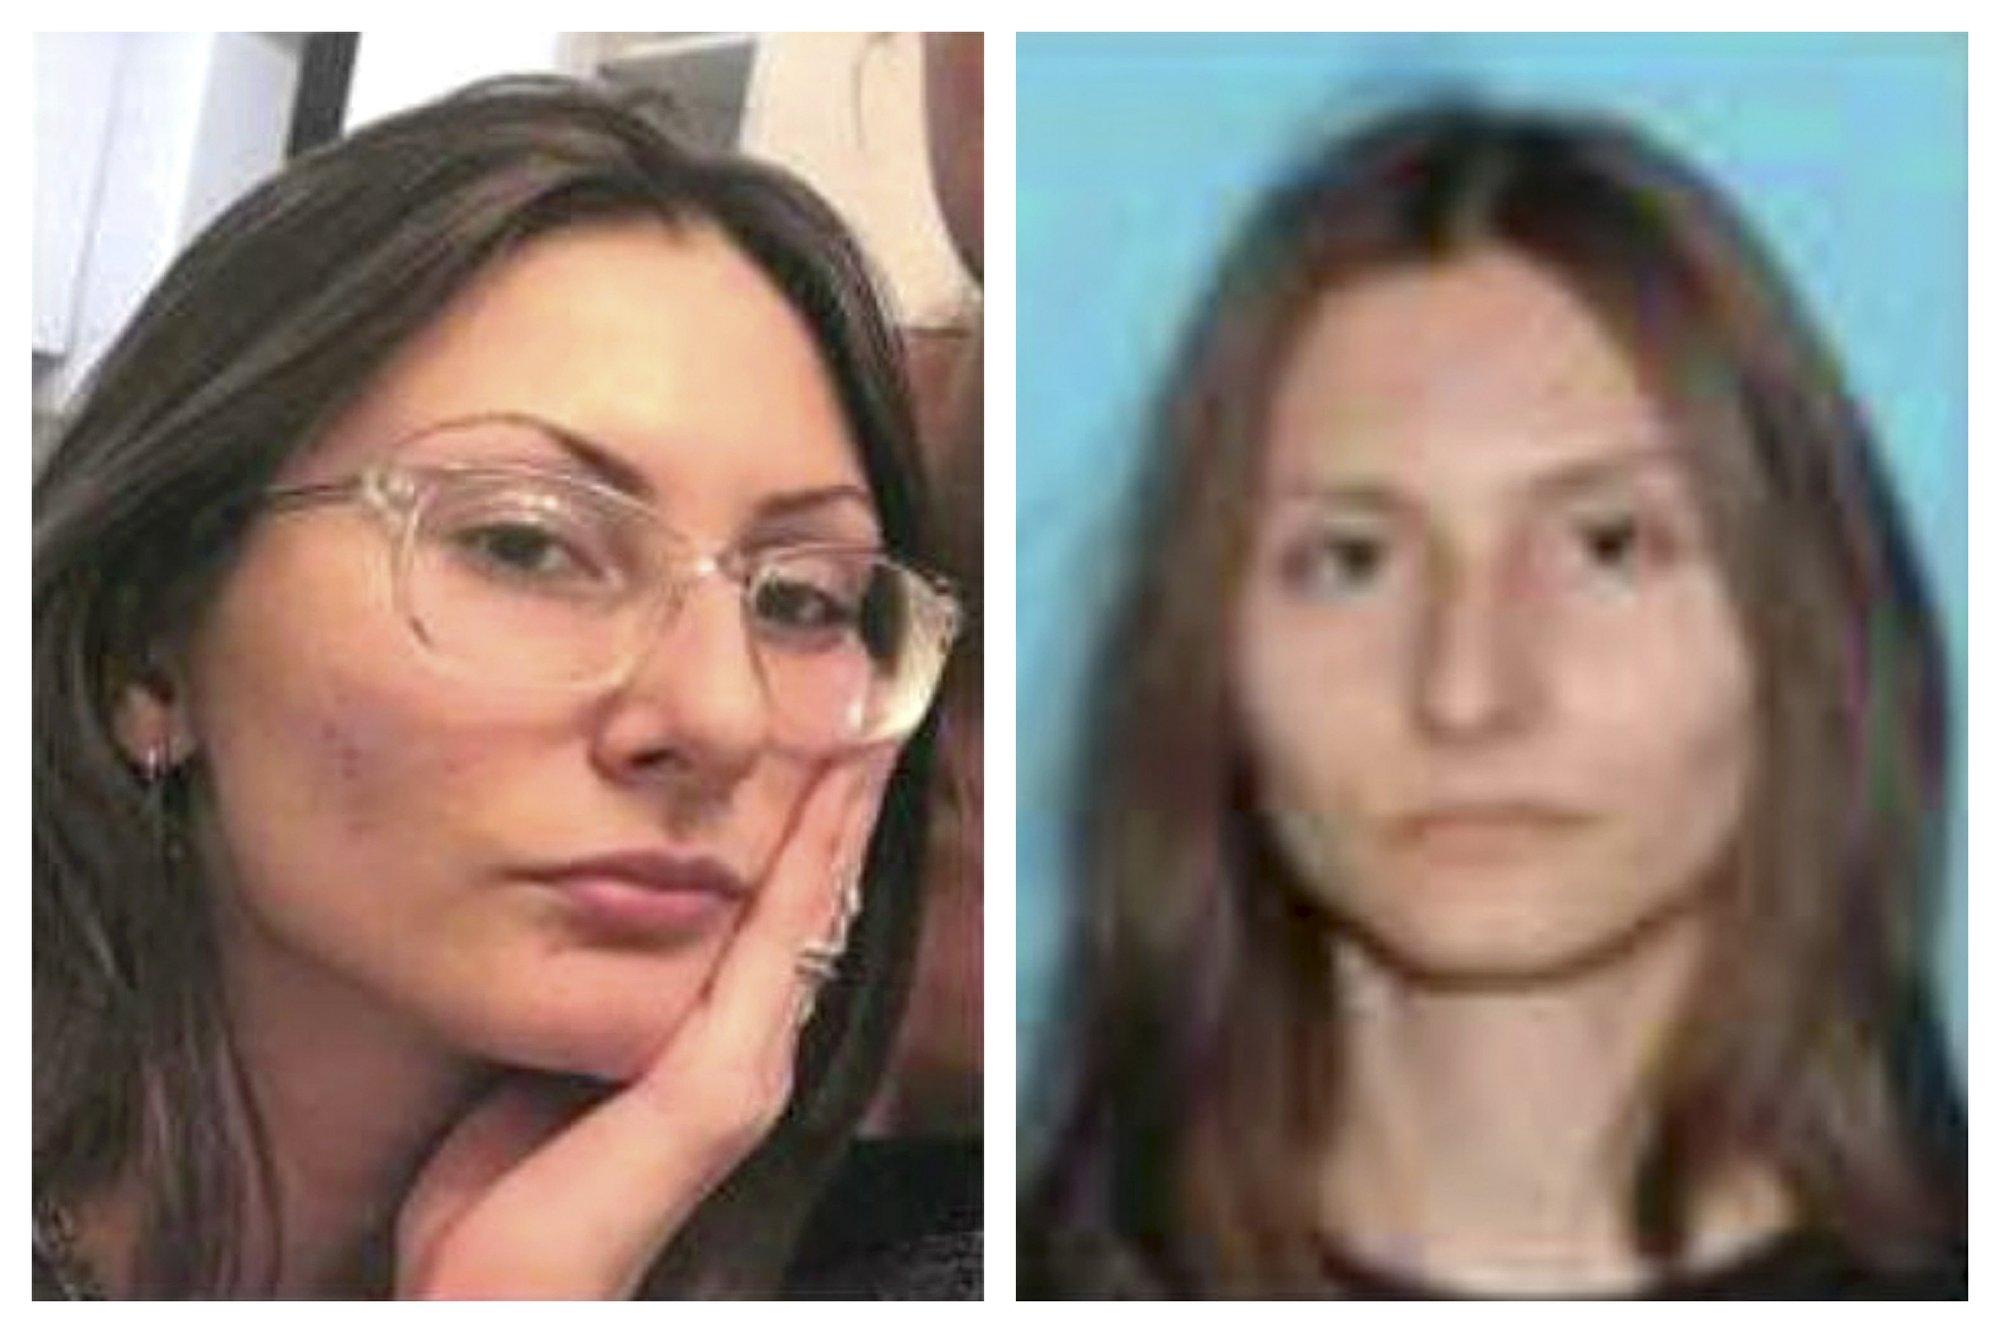 FBI searching for woman who threatened Columbine High School